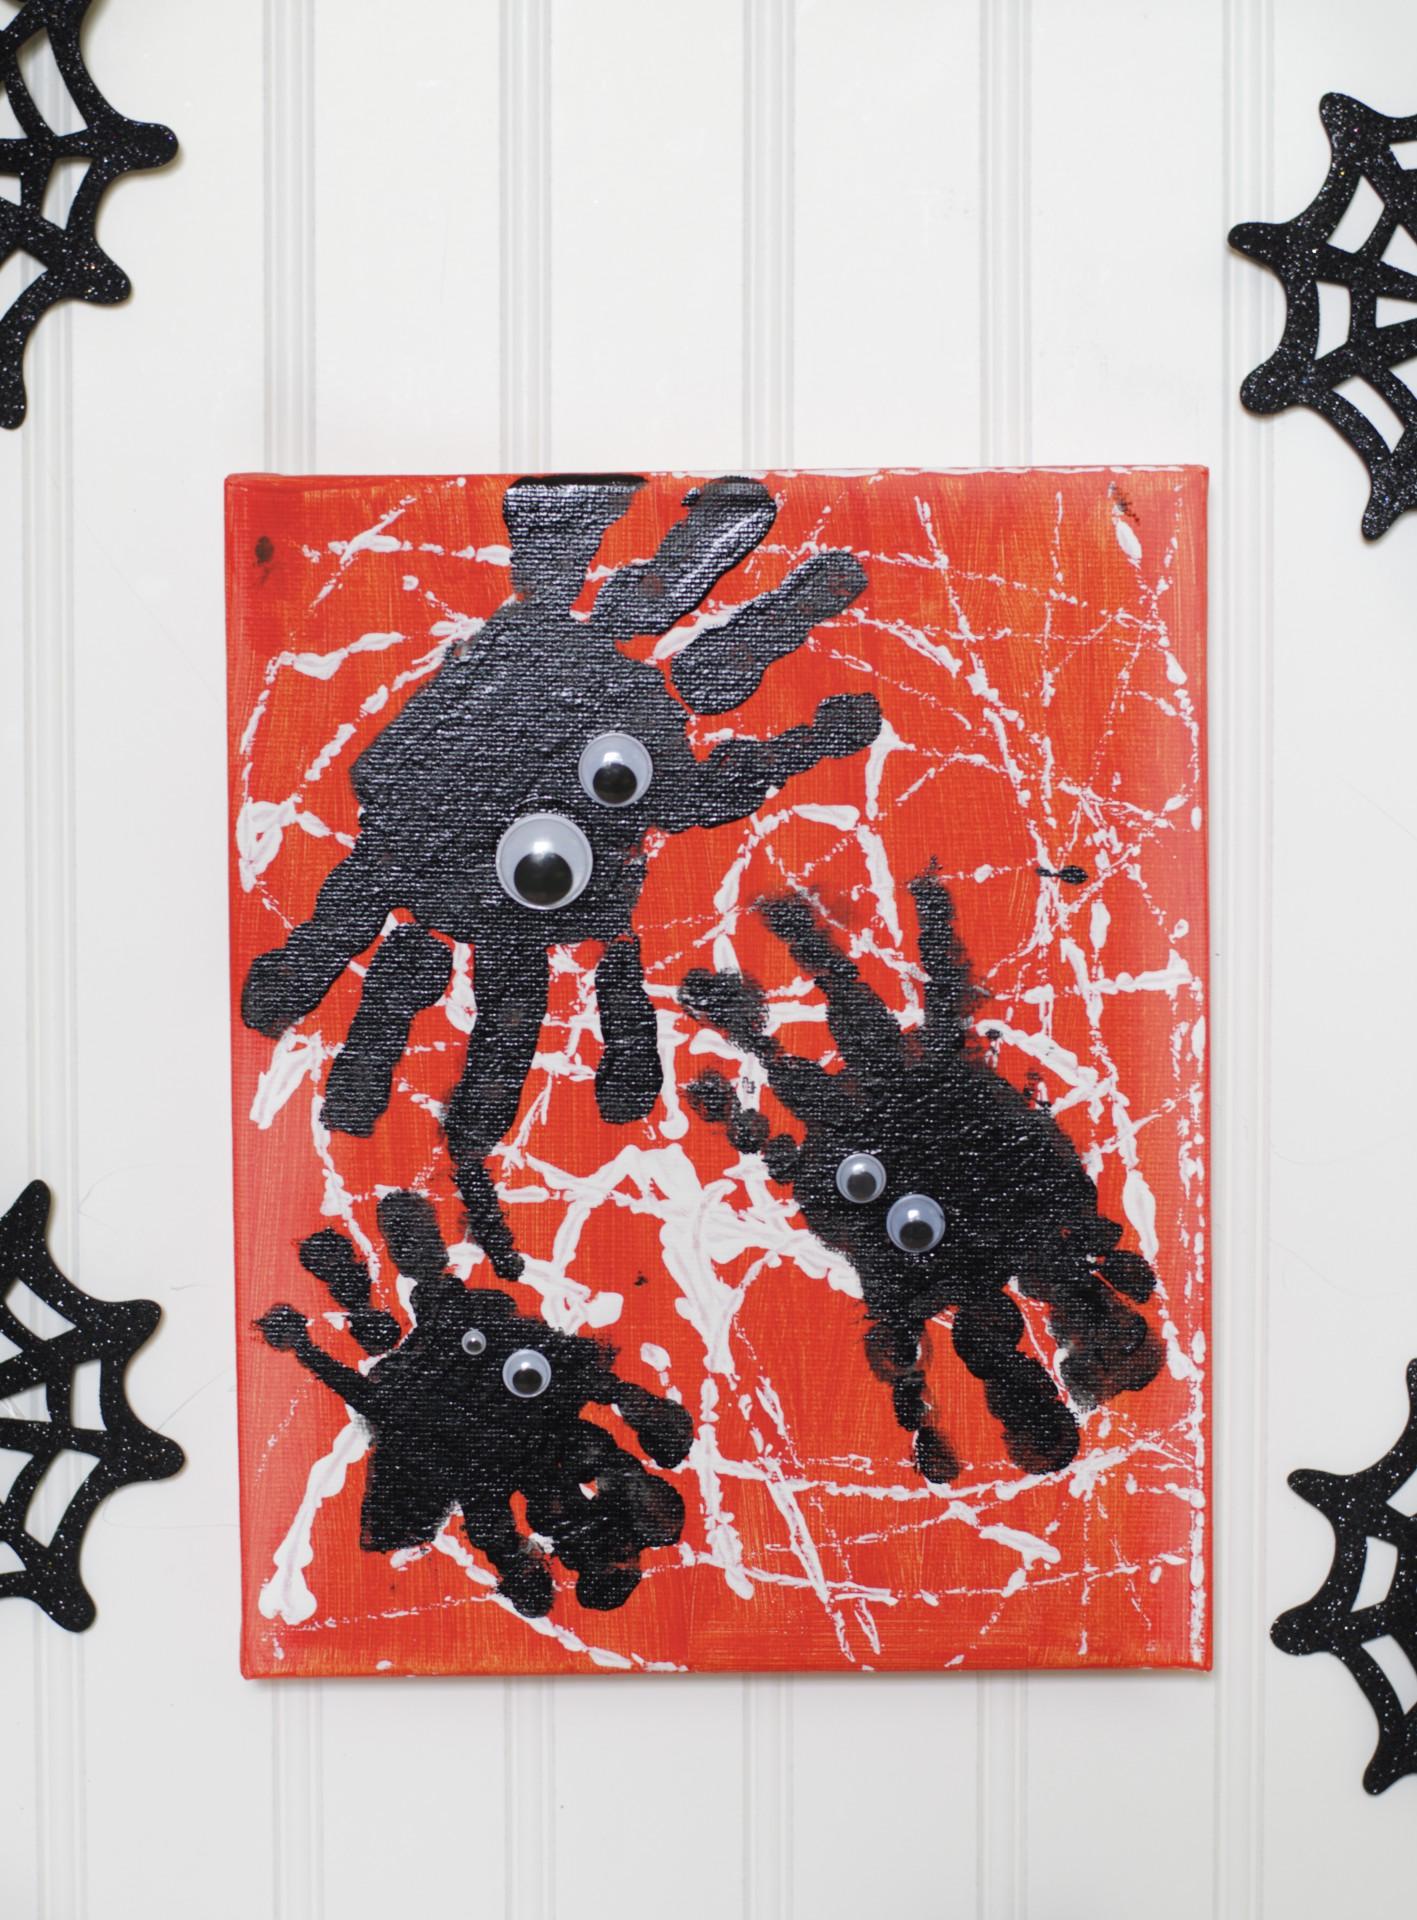 Spooky Spider Handprint Art Fun Family Crafts